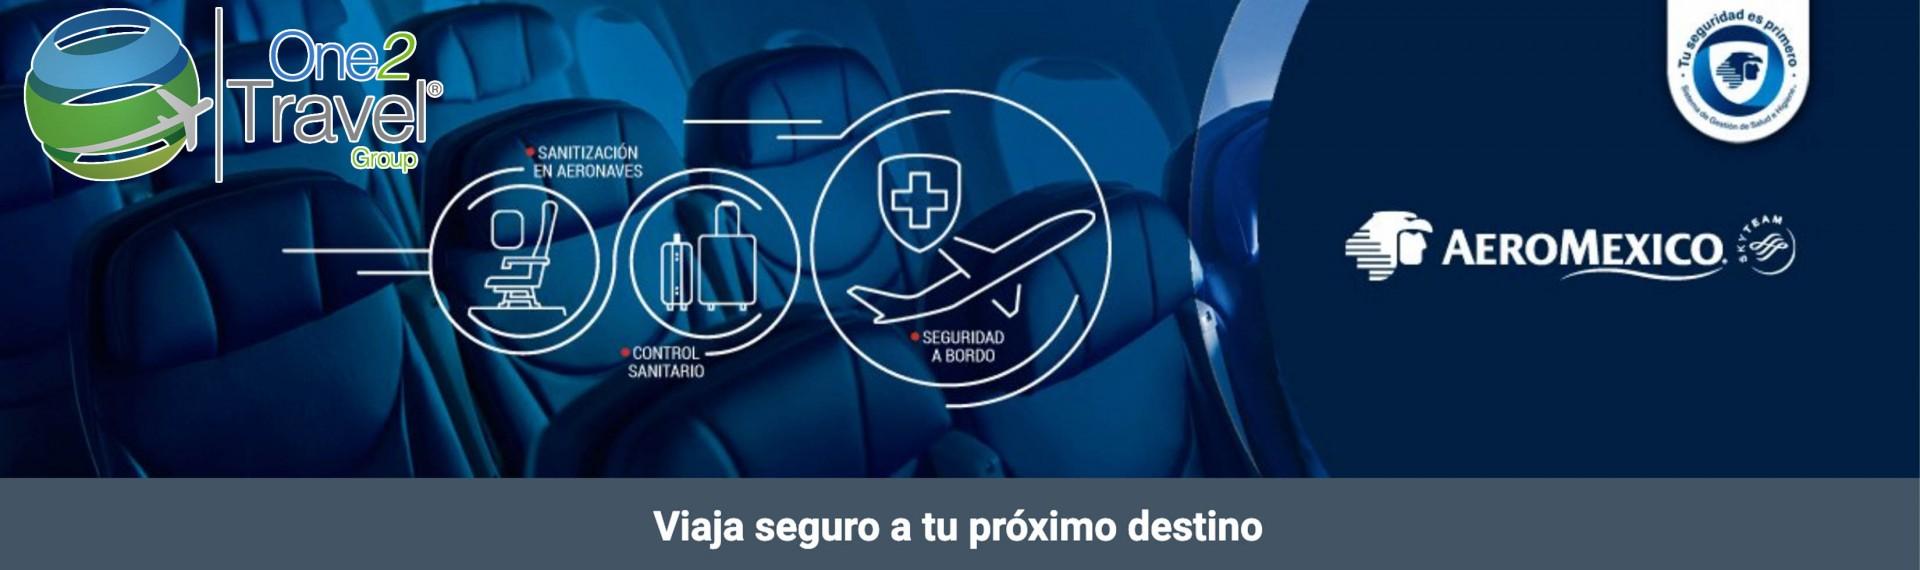 Aeroméxico: Viaja seguro a tu próximo destino